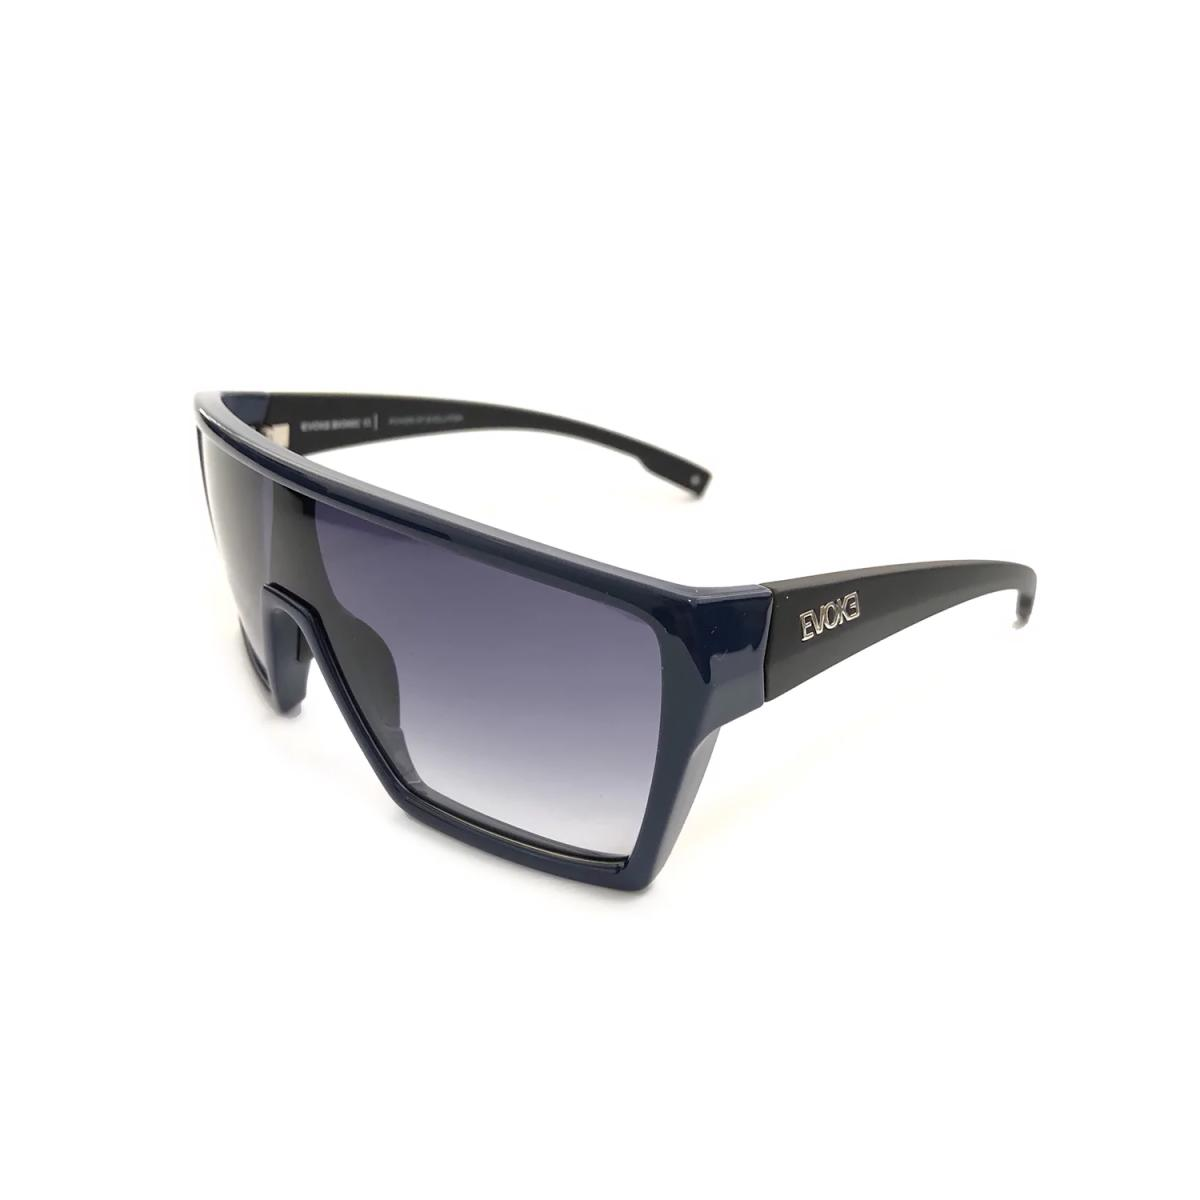 Óculos Evoke - Bionic Alfa D01 Blue Shine Black